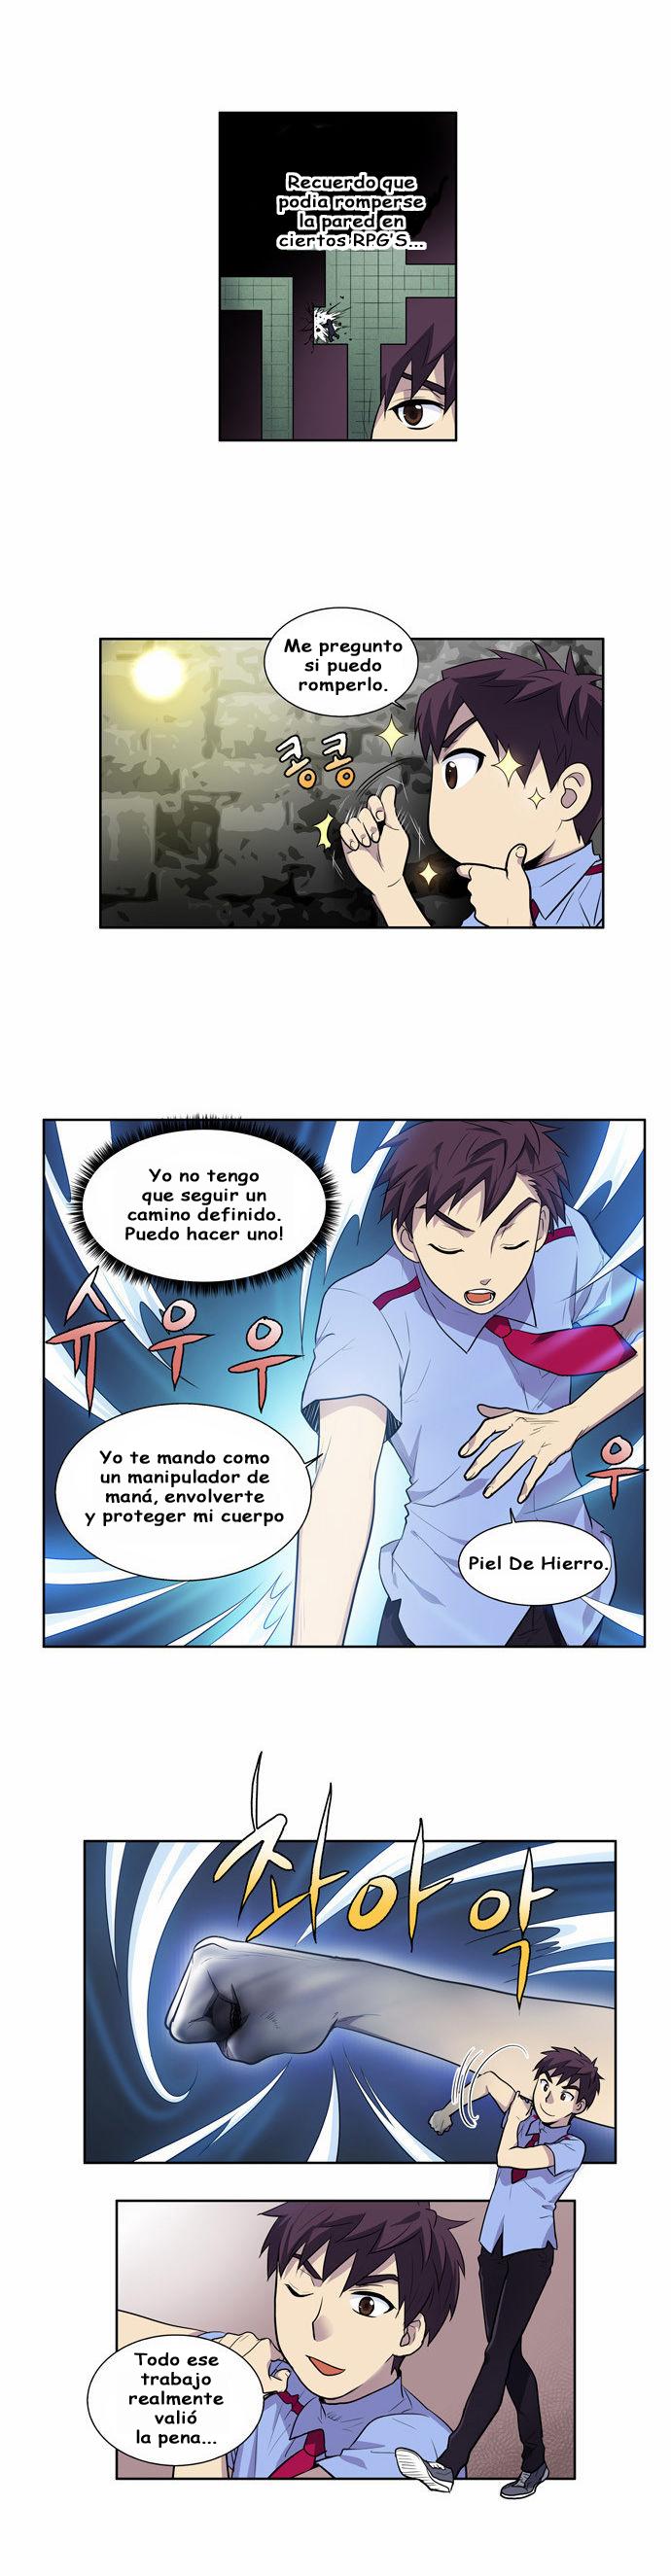 http://c5.ninemanga.com/es_manga/61/1725/396908/b4892f808f9efbd561cecbfbec3ad20d.jpg Page 9